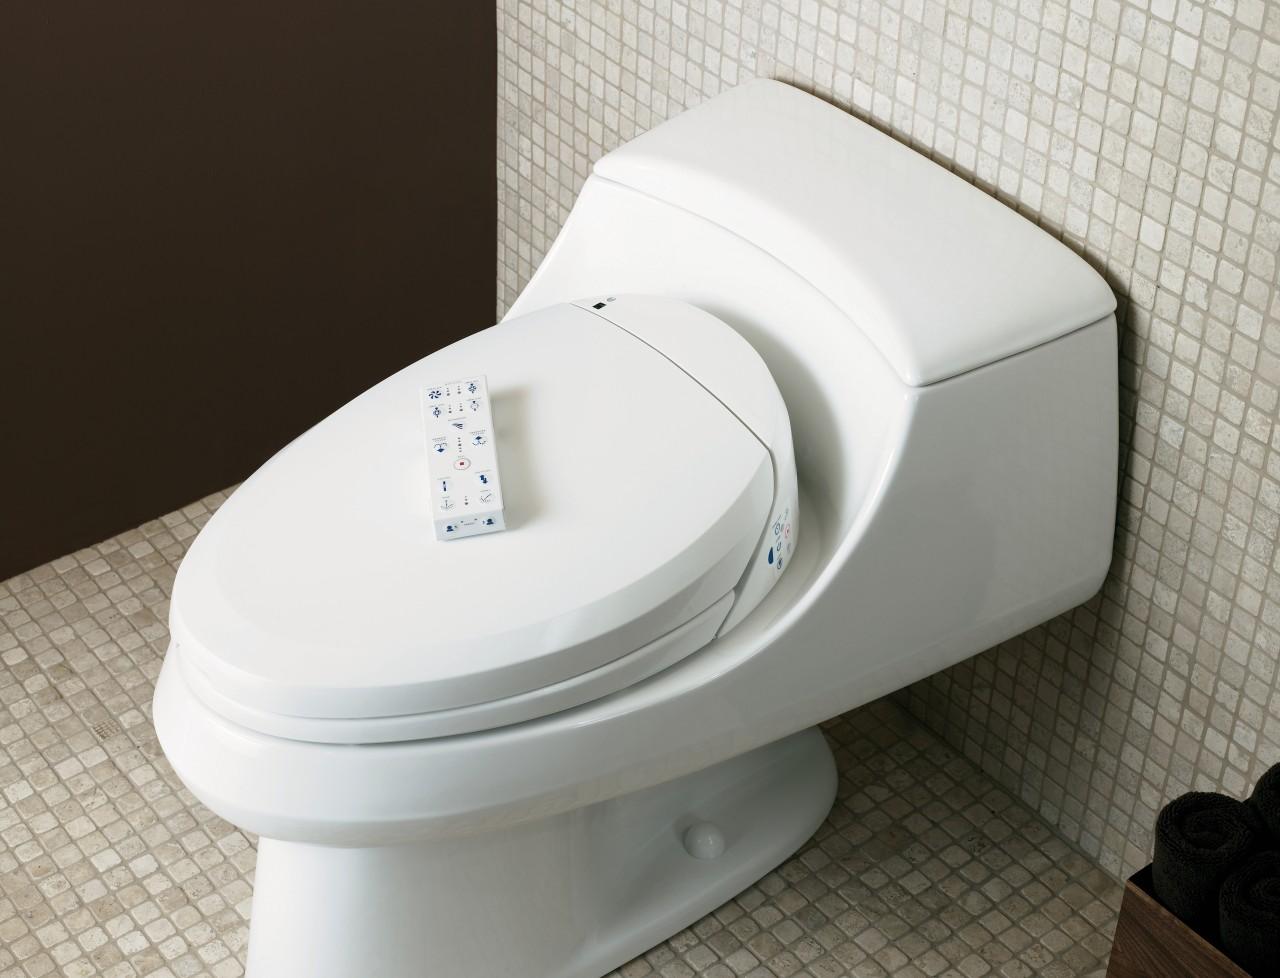 The Kohler C toliet seat offers a choice bidet, hardware, plumbing fixture, product, product design, toilet, toilet seat, white, black, gray